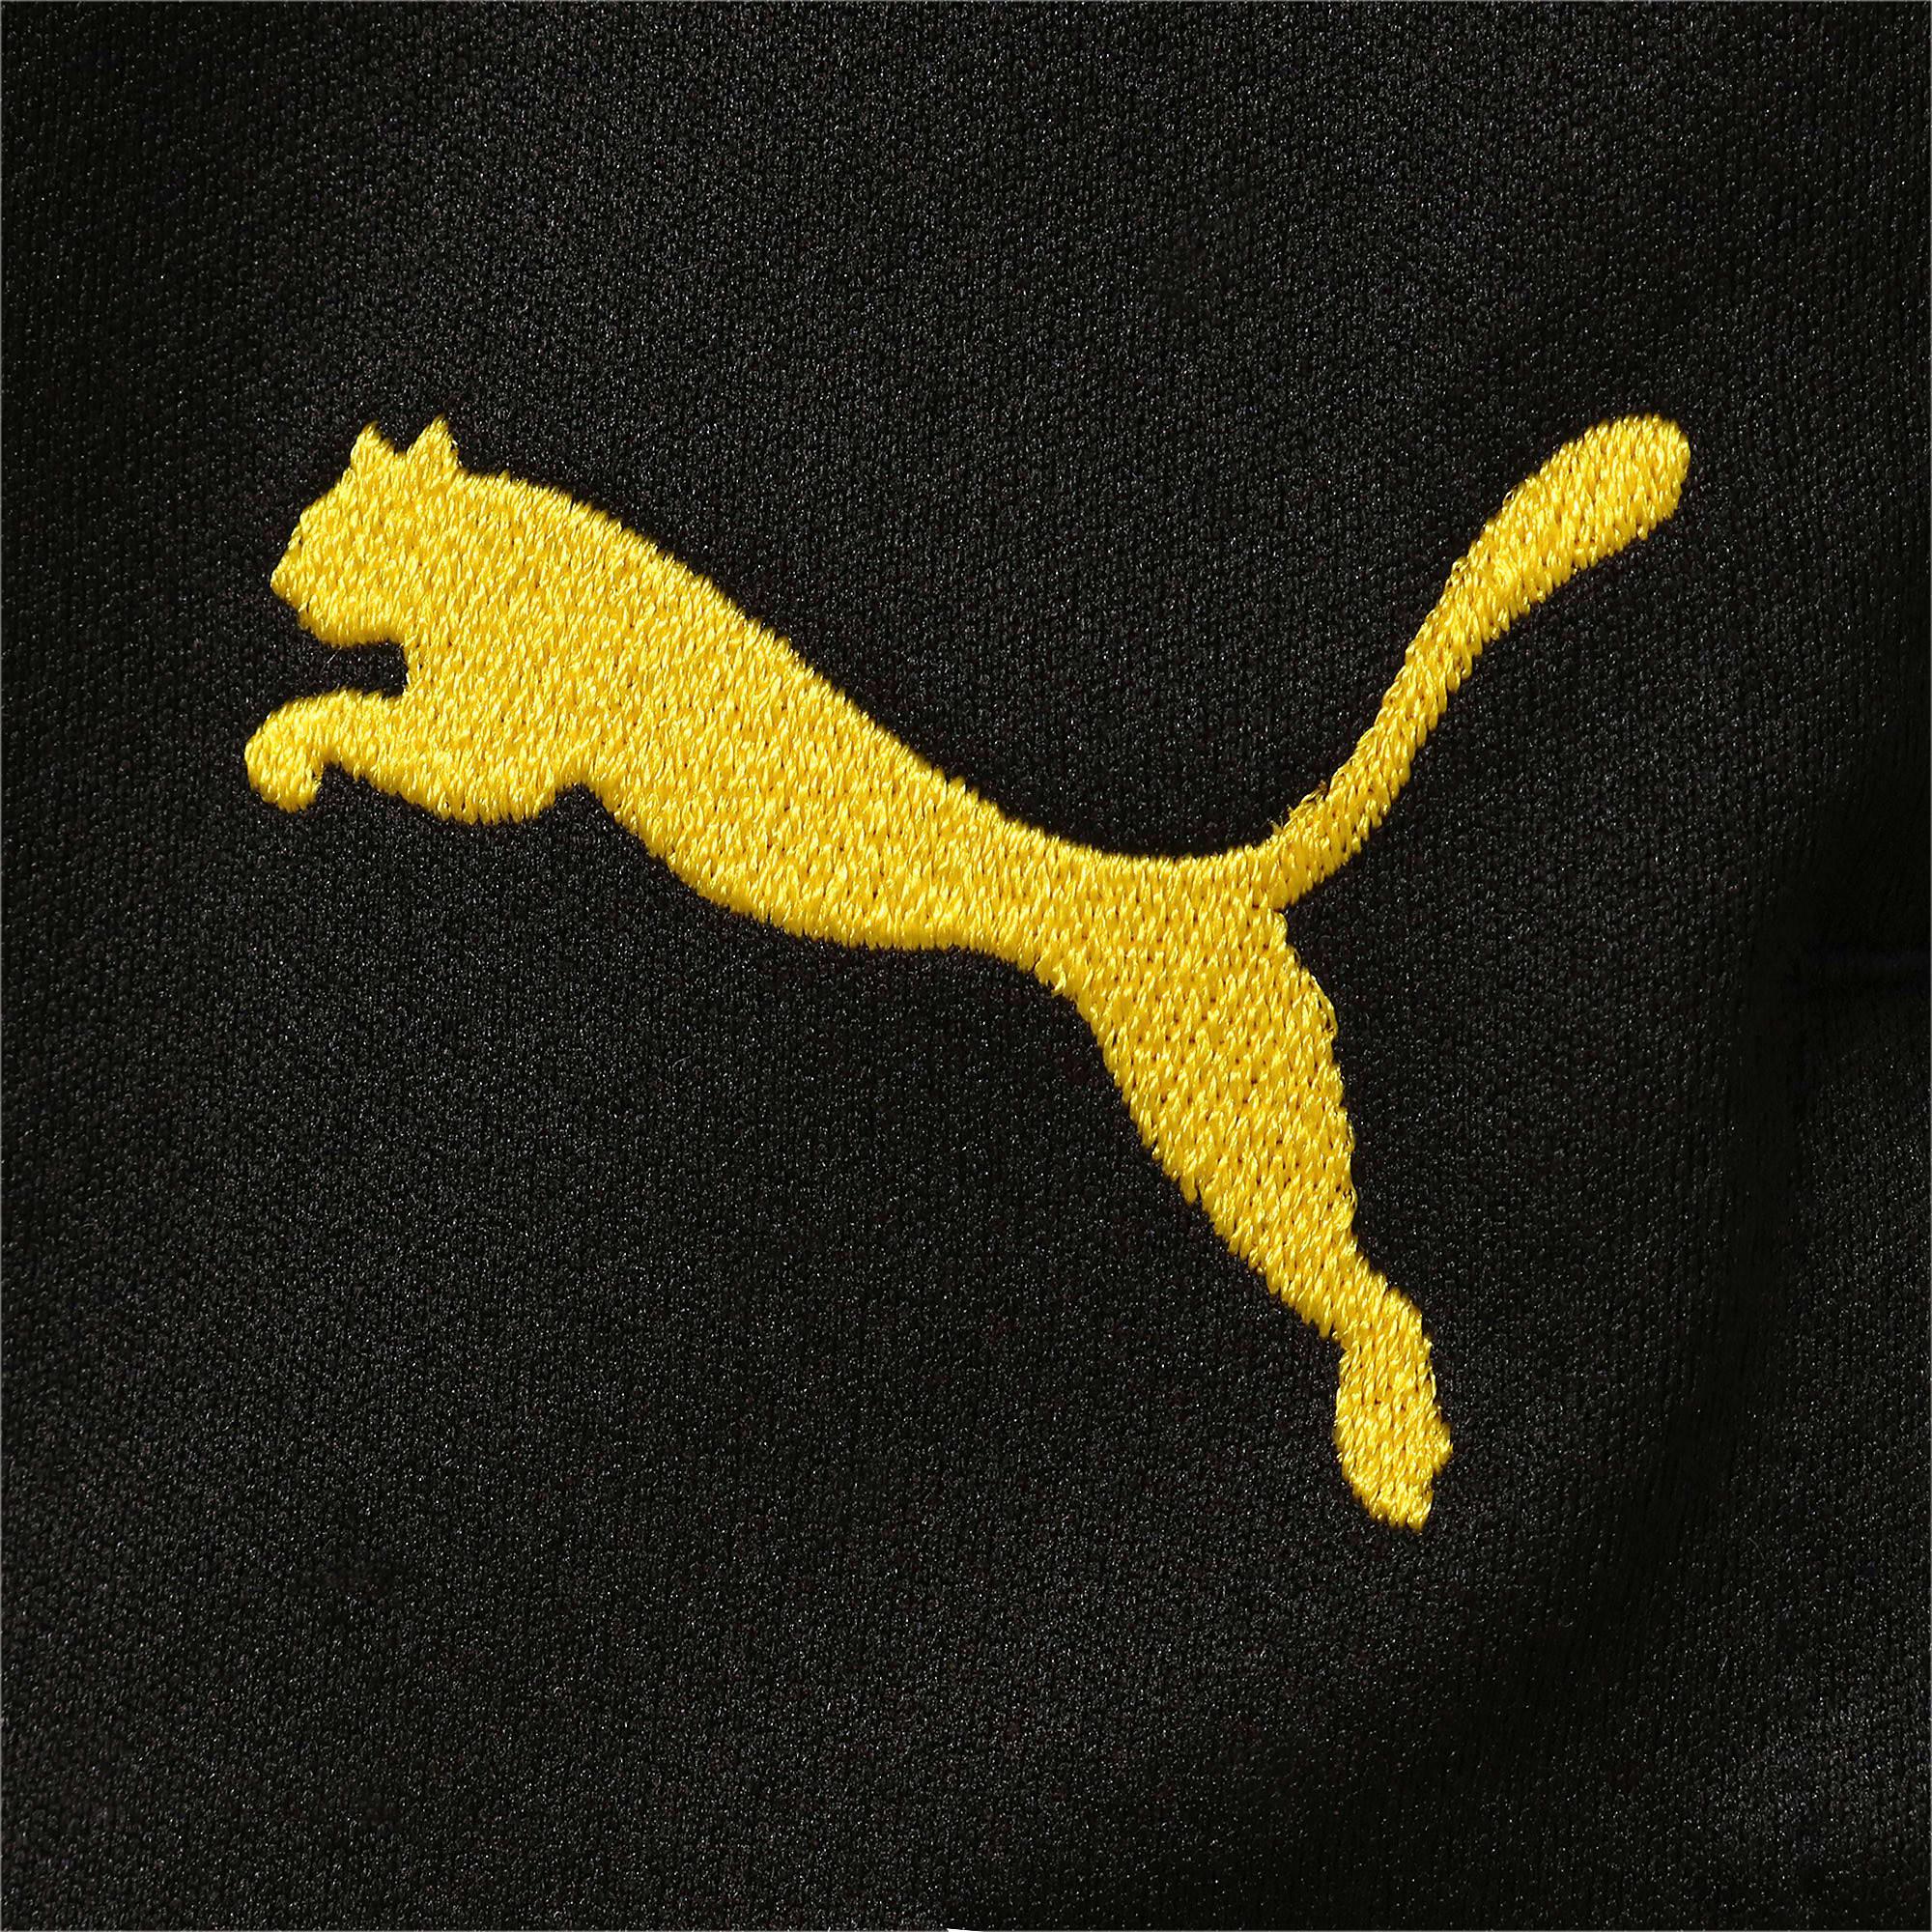 Thumbnail 4 of BVB レプリカショーツ, Puma Black-Cyber Yellow, medium-JPN